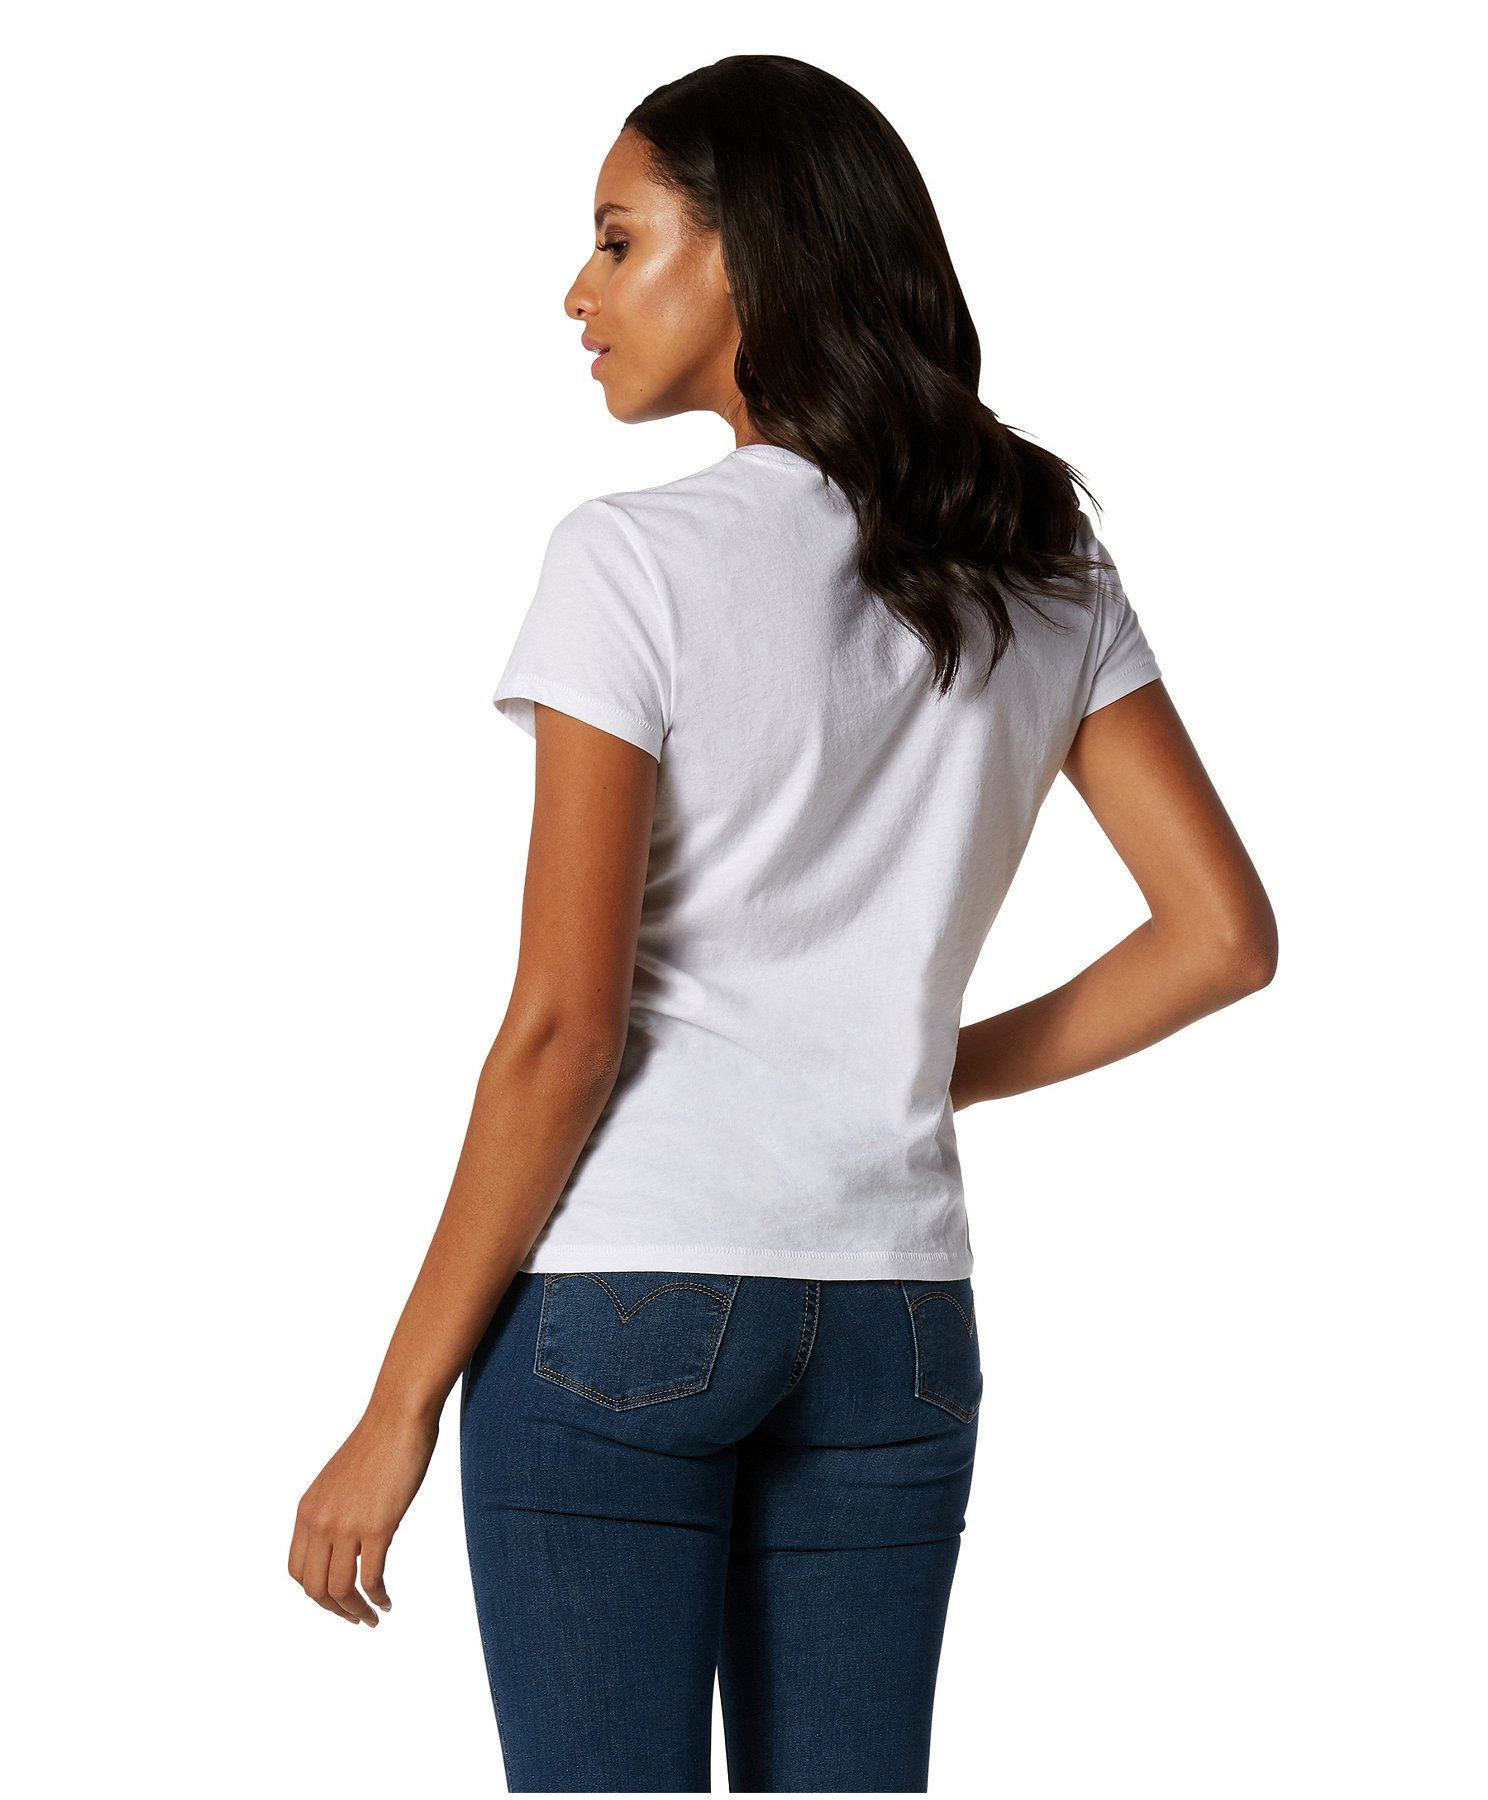 Gant Blanc T-shirt à encolure ras-du-cou